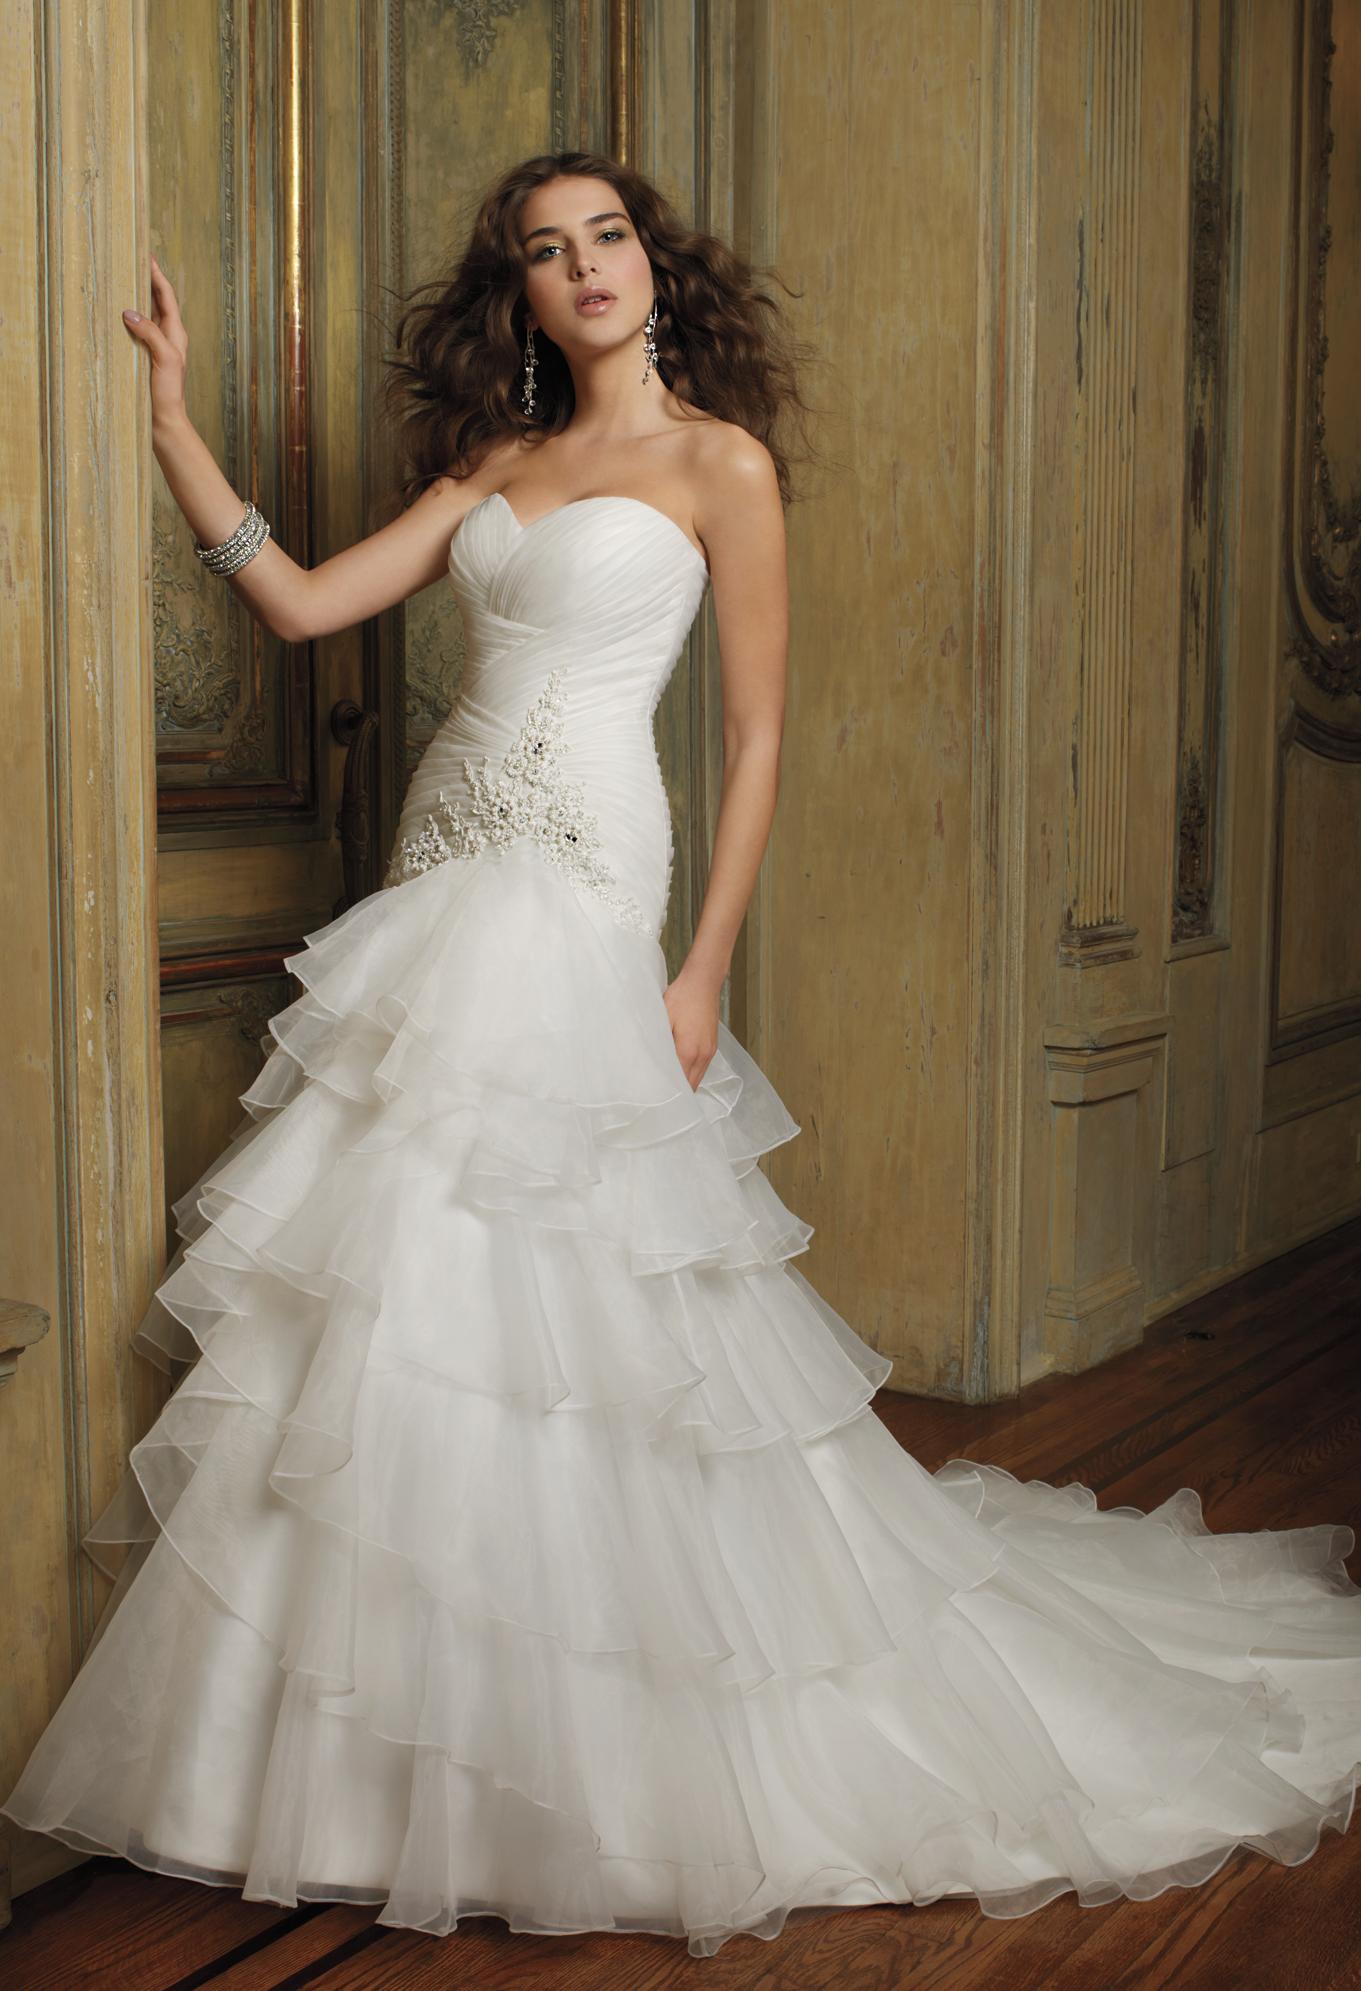 Style No. 41790-8411W